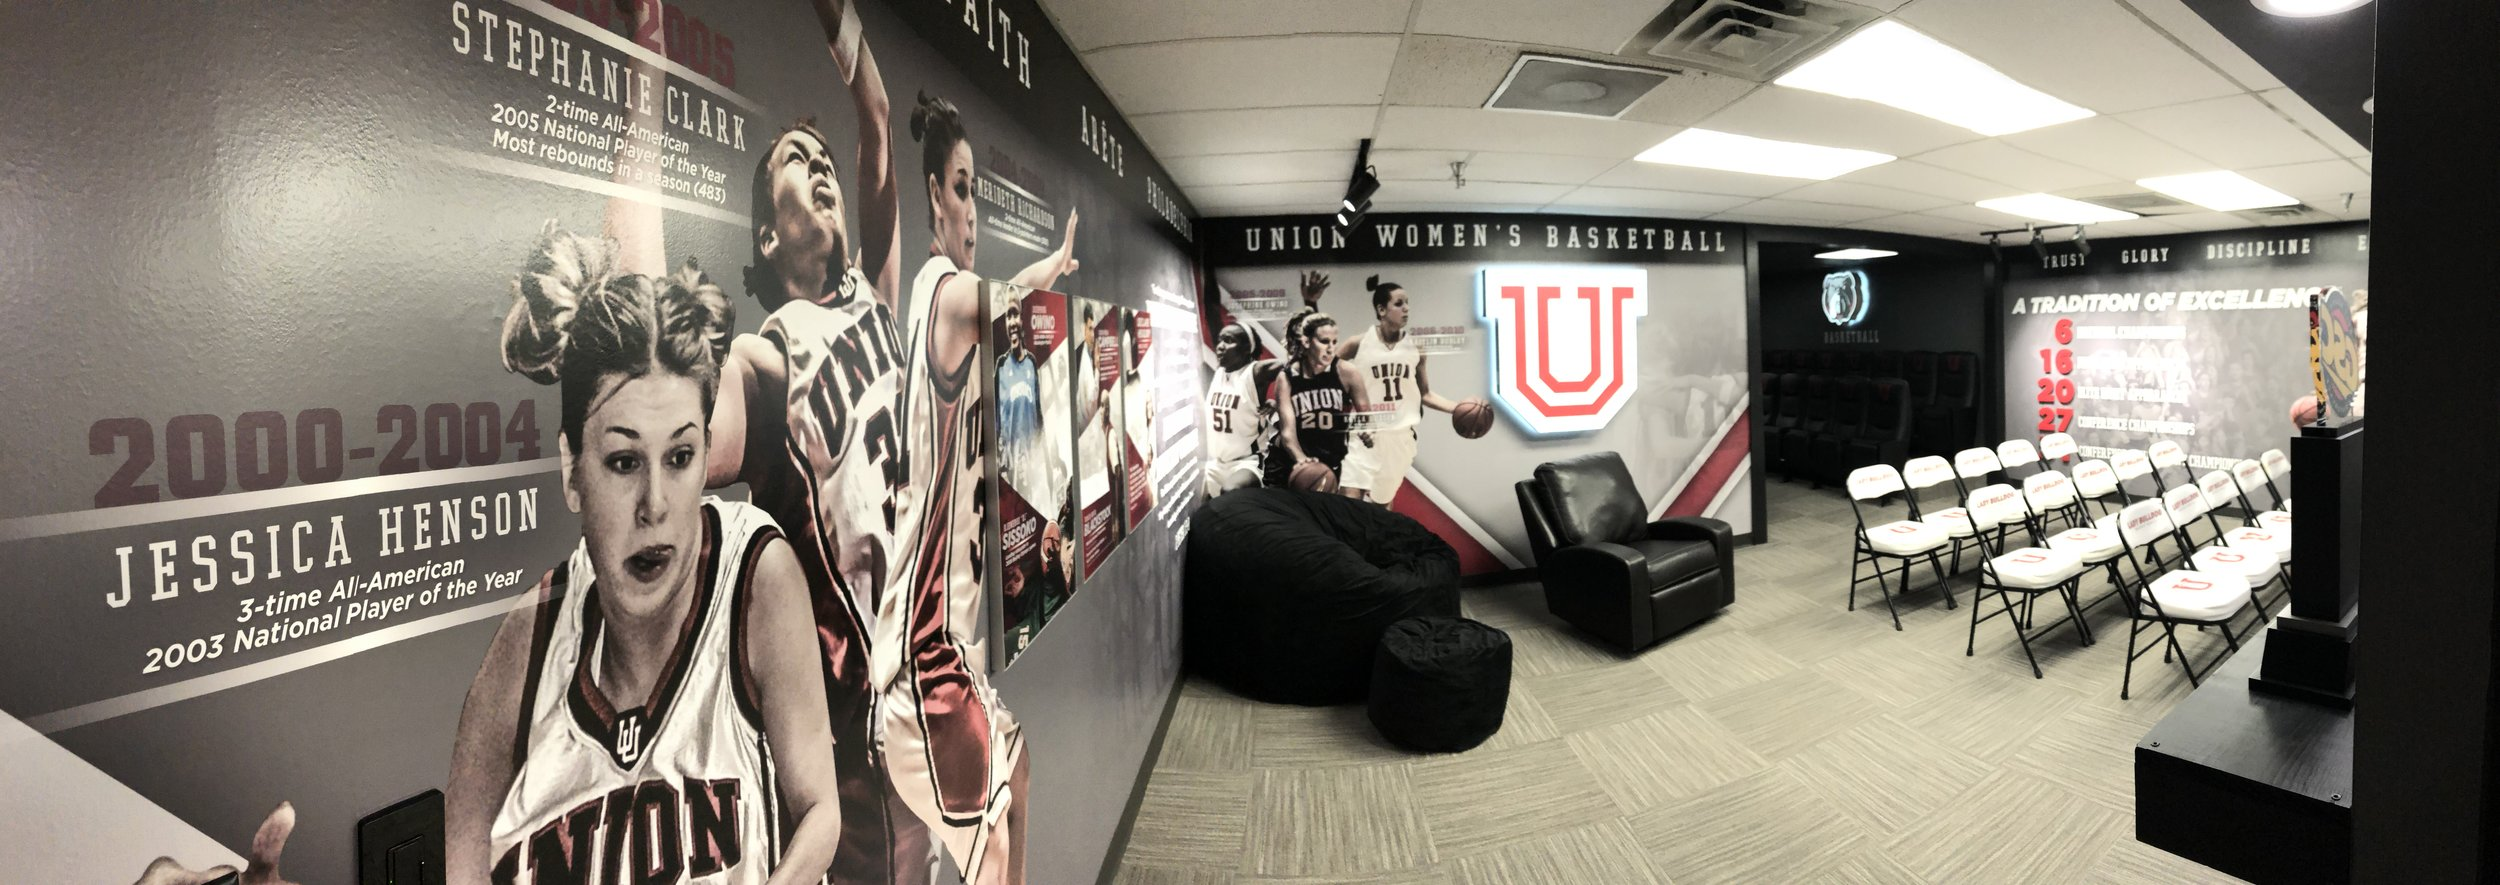 After-Union-University_Womens-Basketball-Locker-Room_Interior-Branding_LSIGraphics_Memphis-TN-2 ..